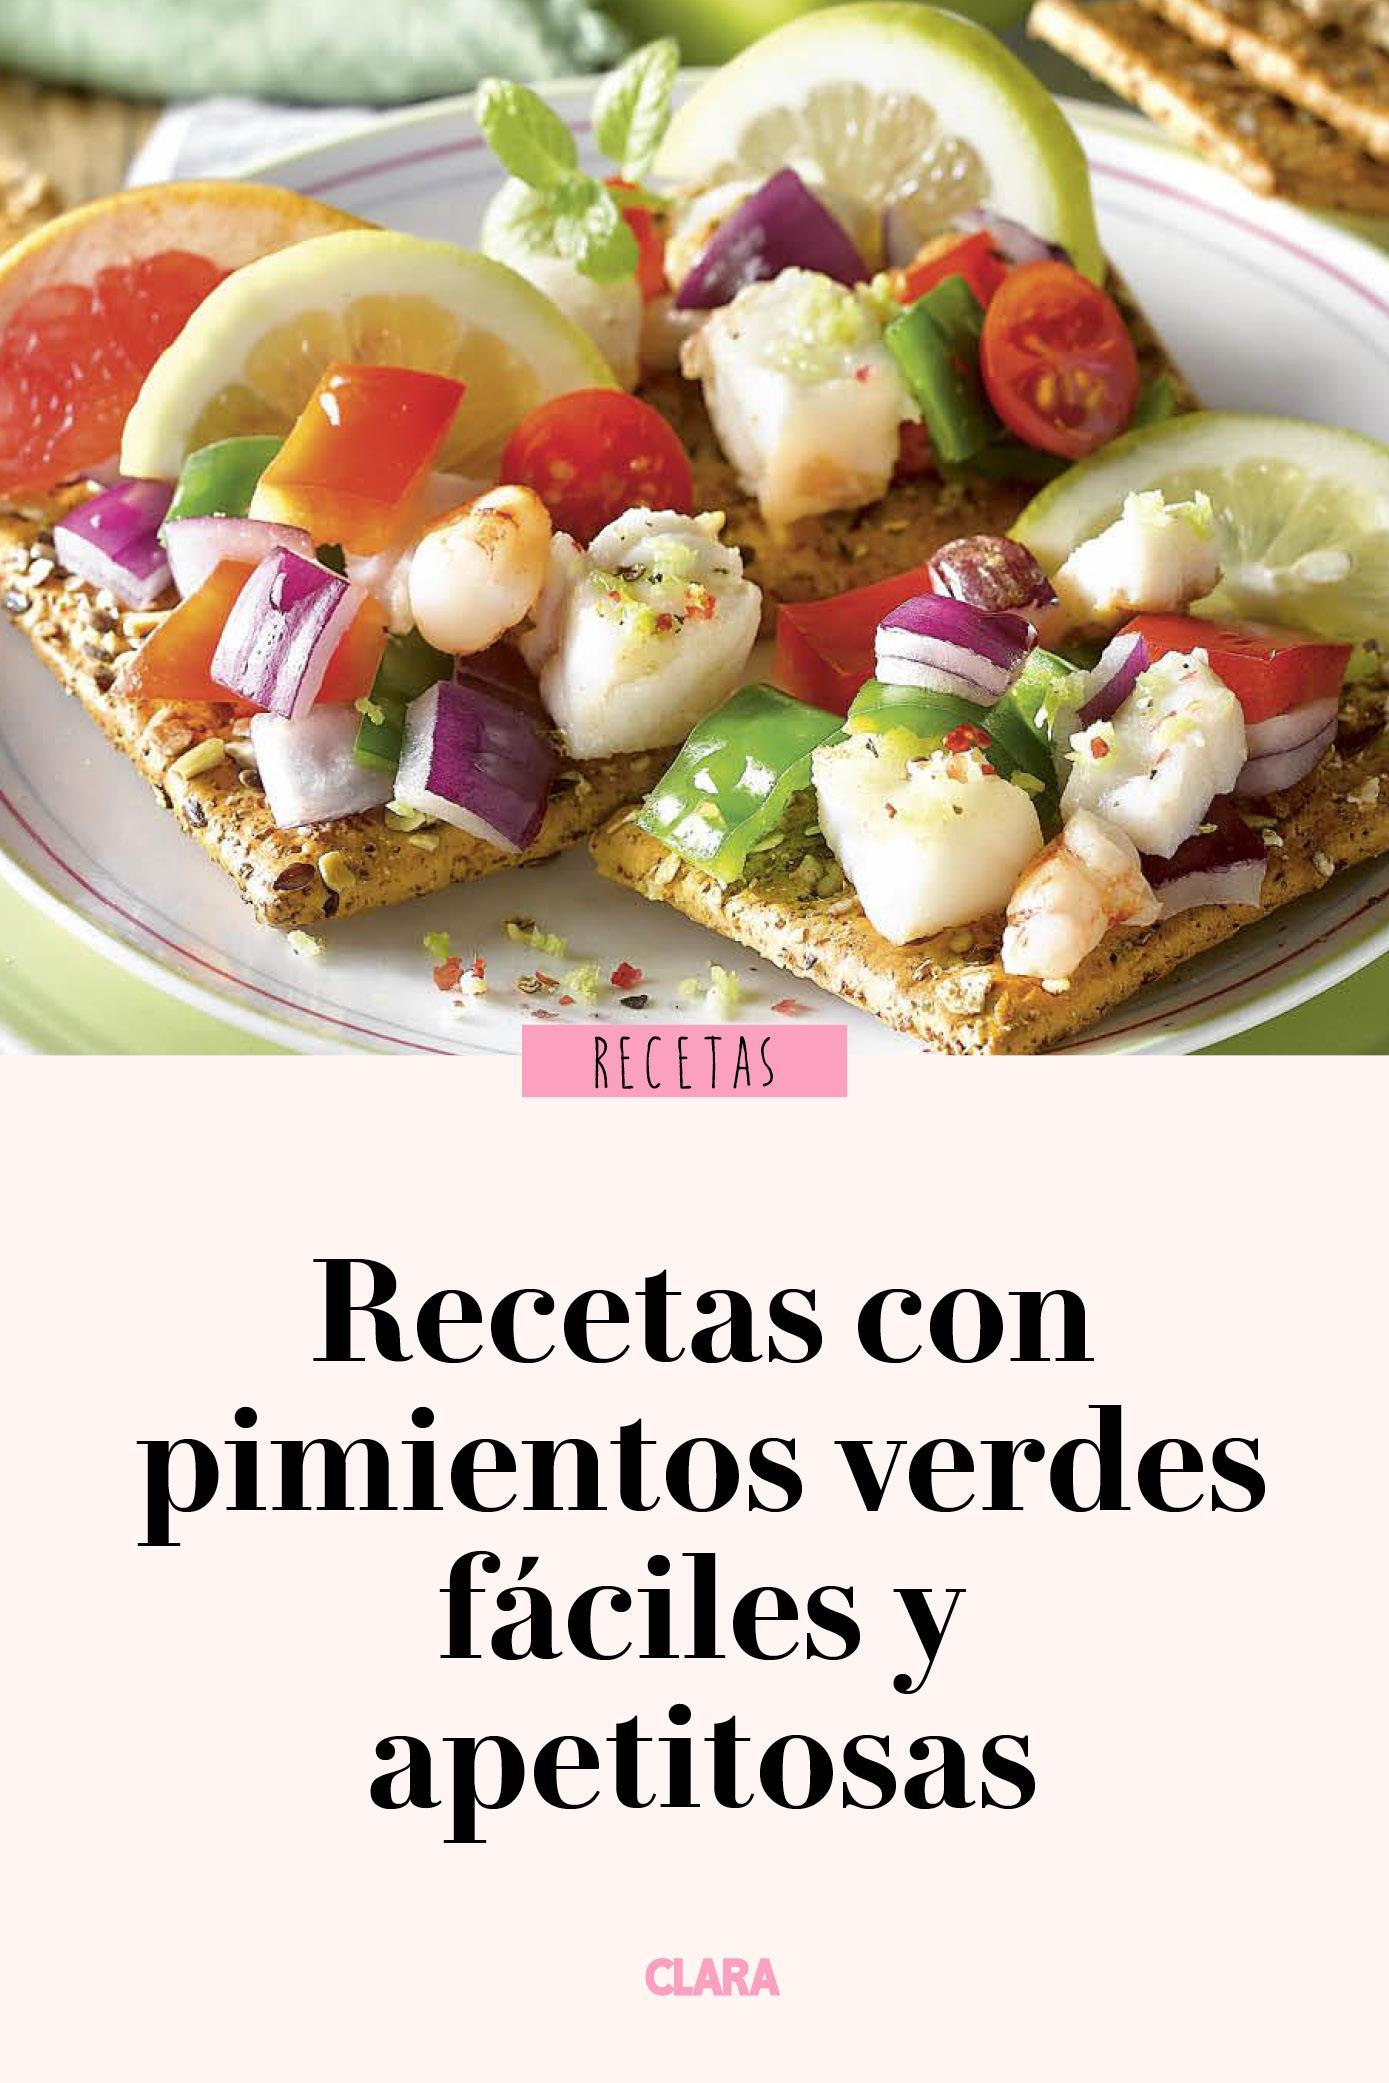 Recetas - cover